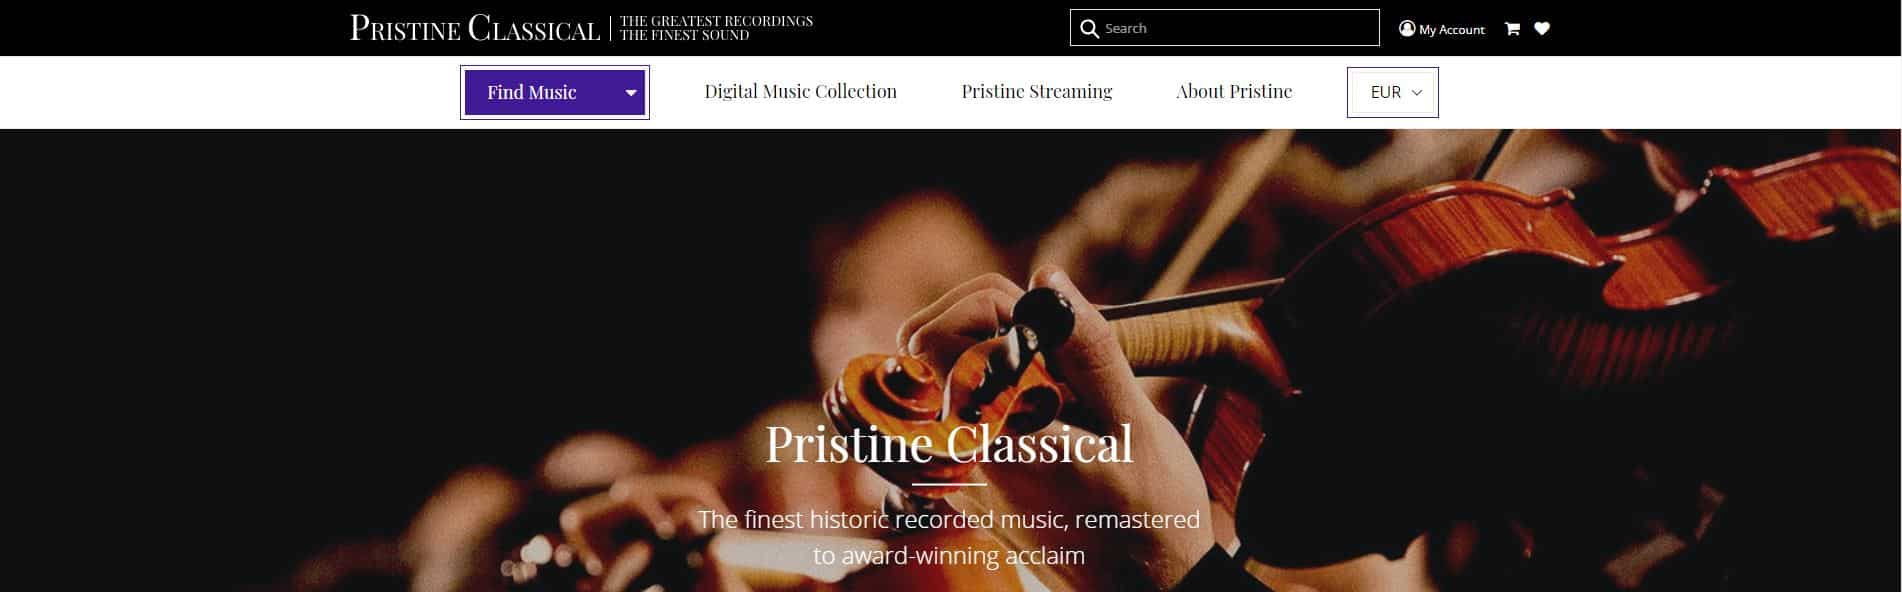 pristine clasical website